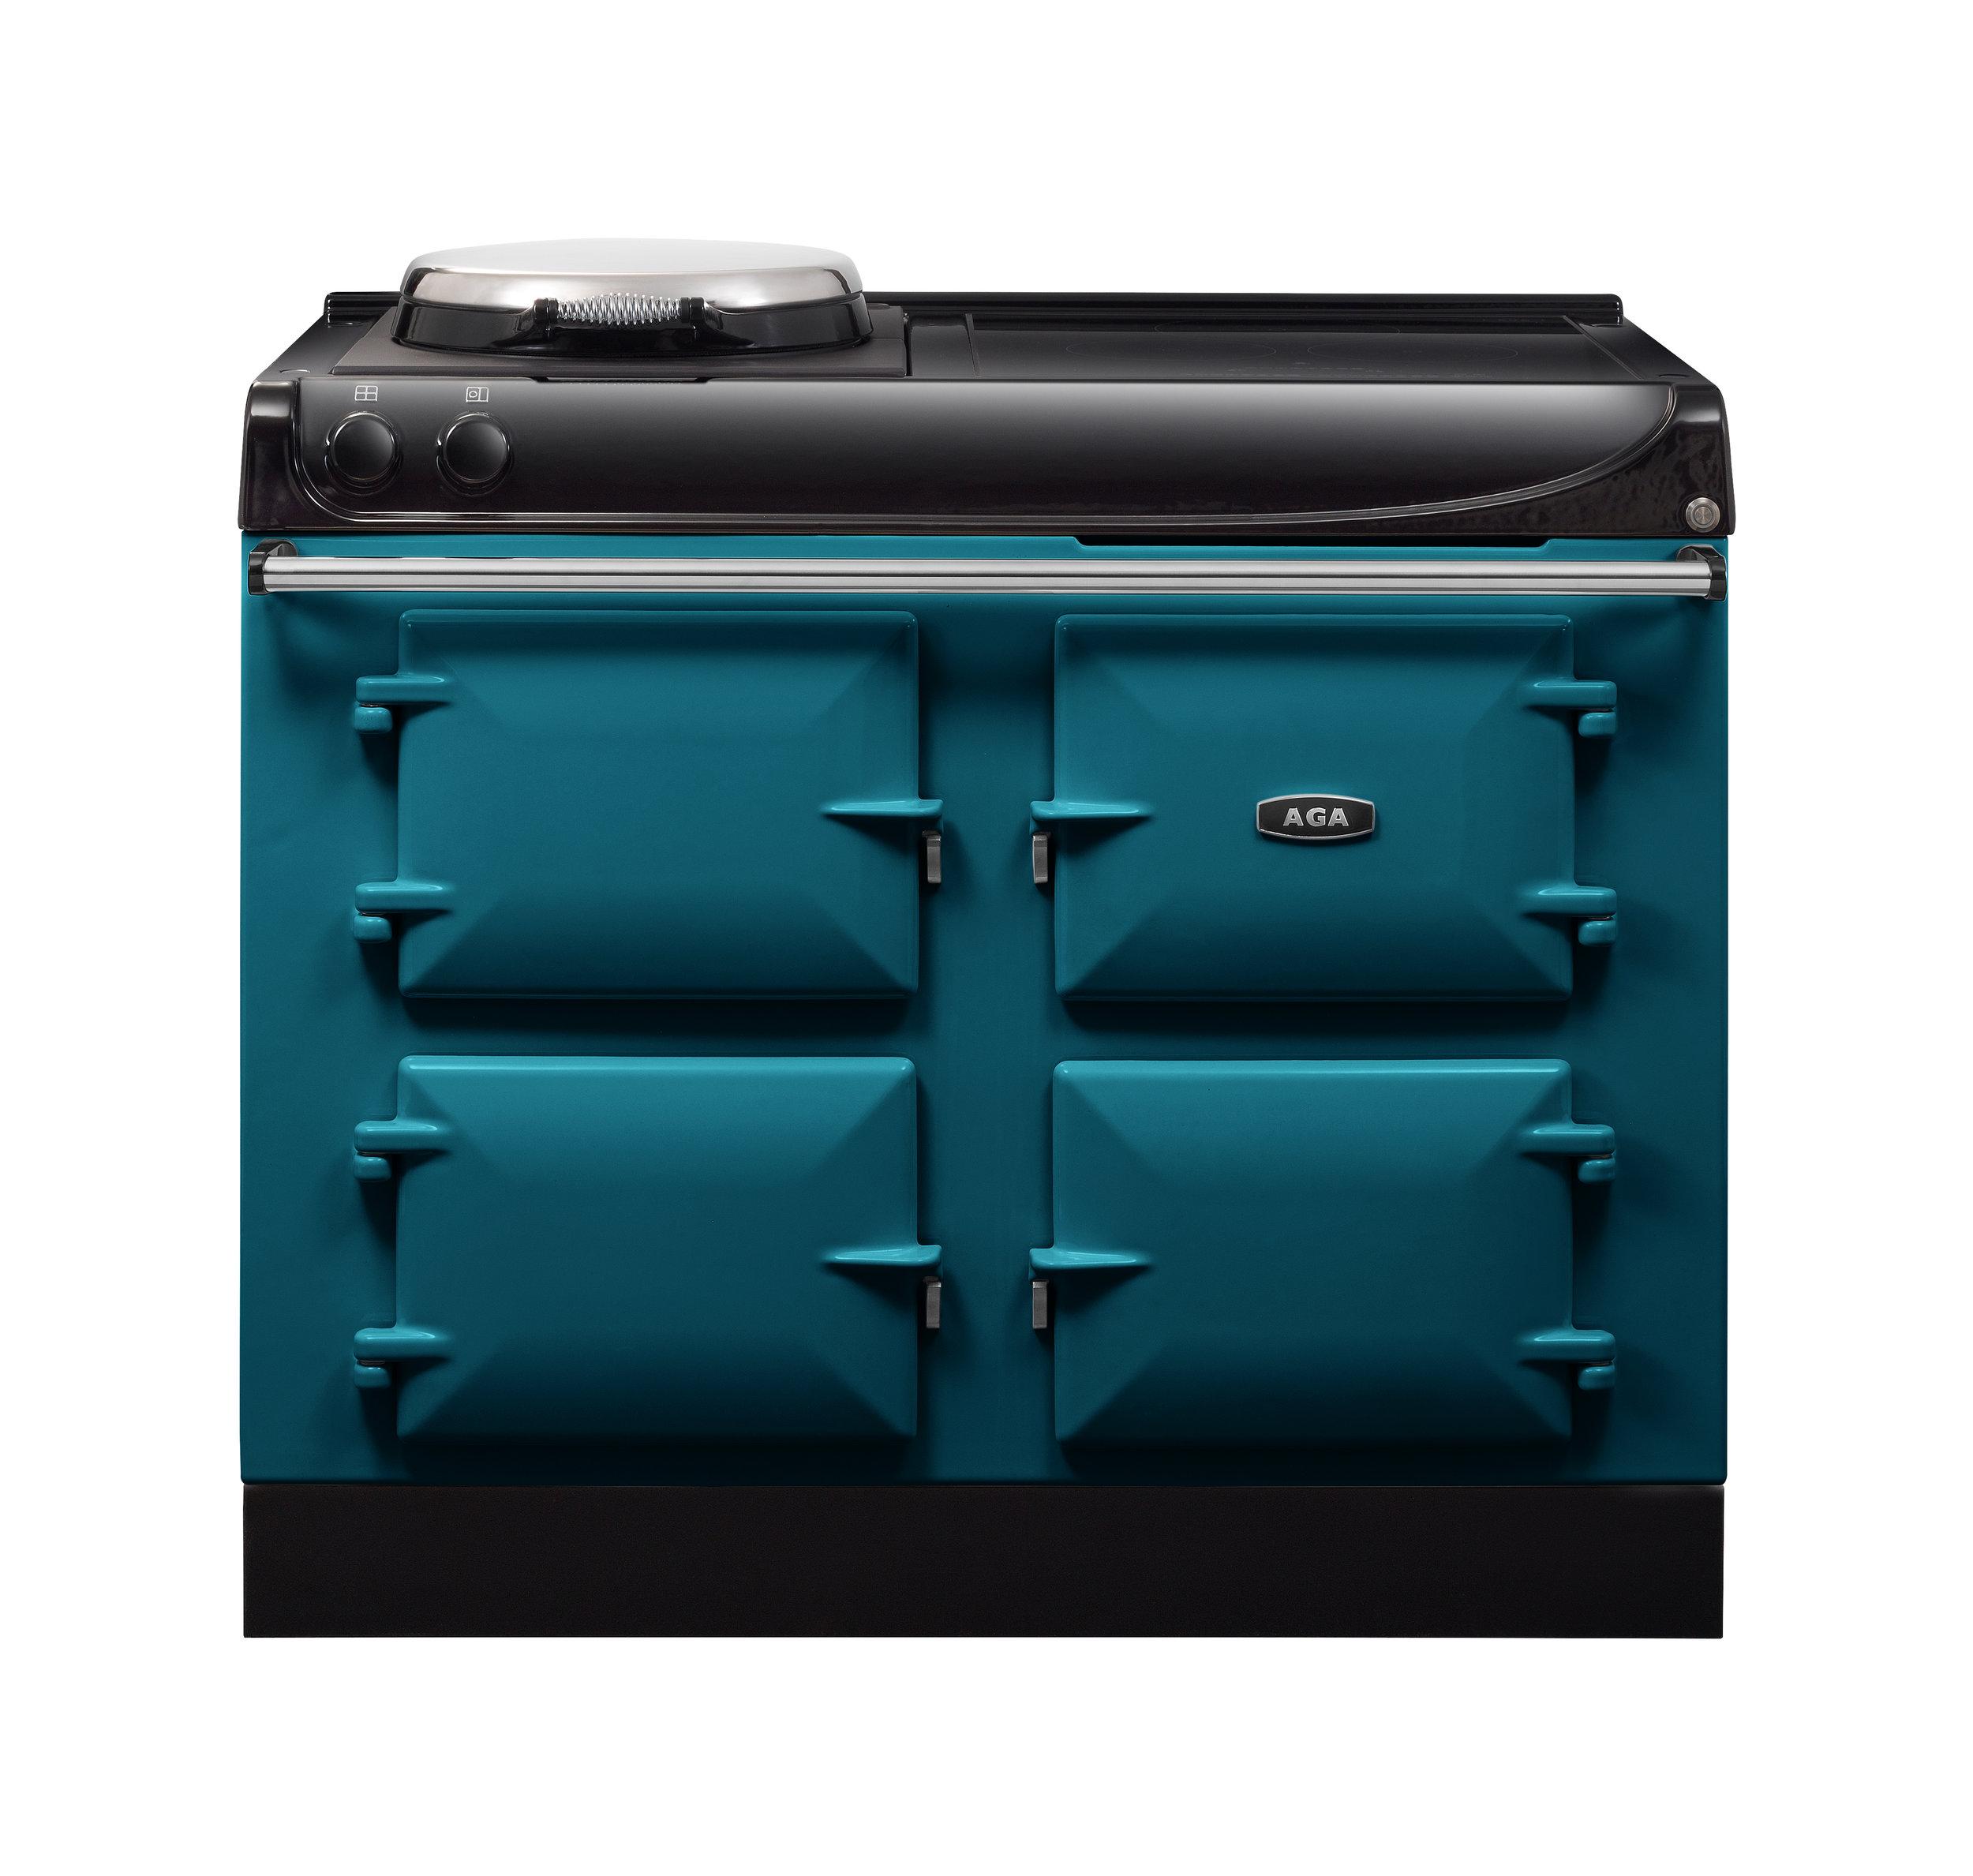 AGA 3 Series 110_Salcombe Blue.jpg